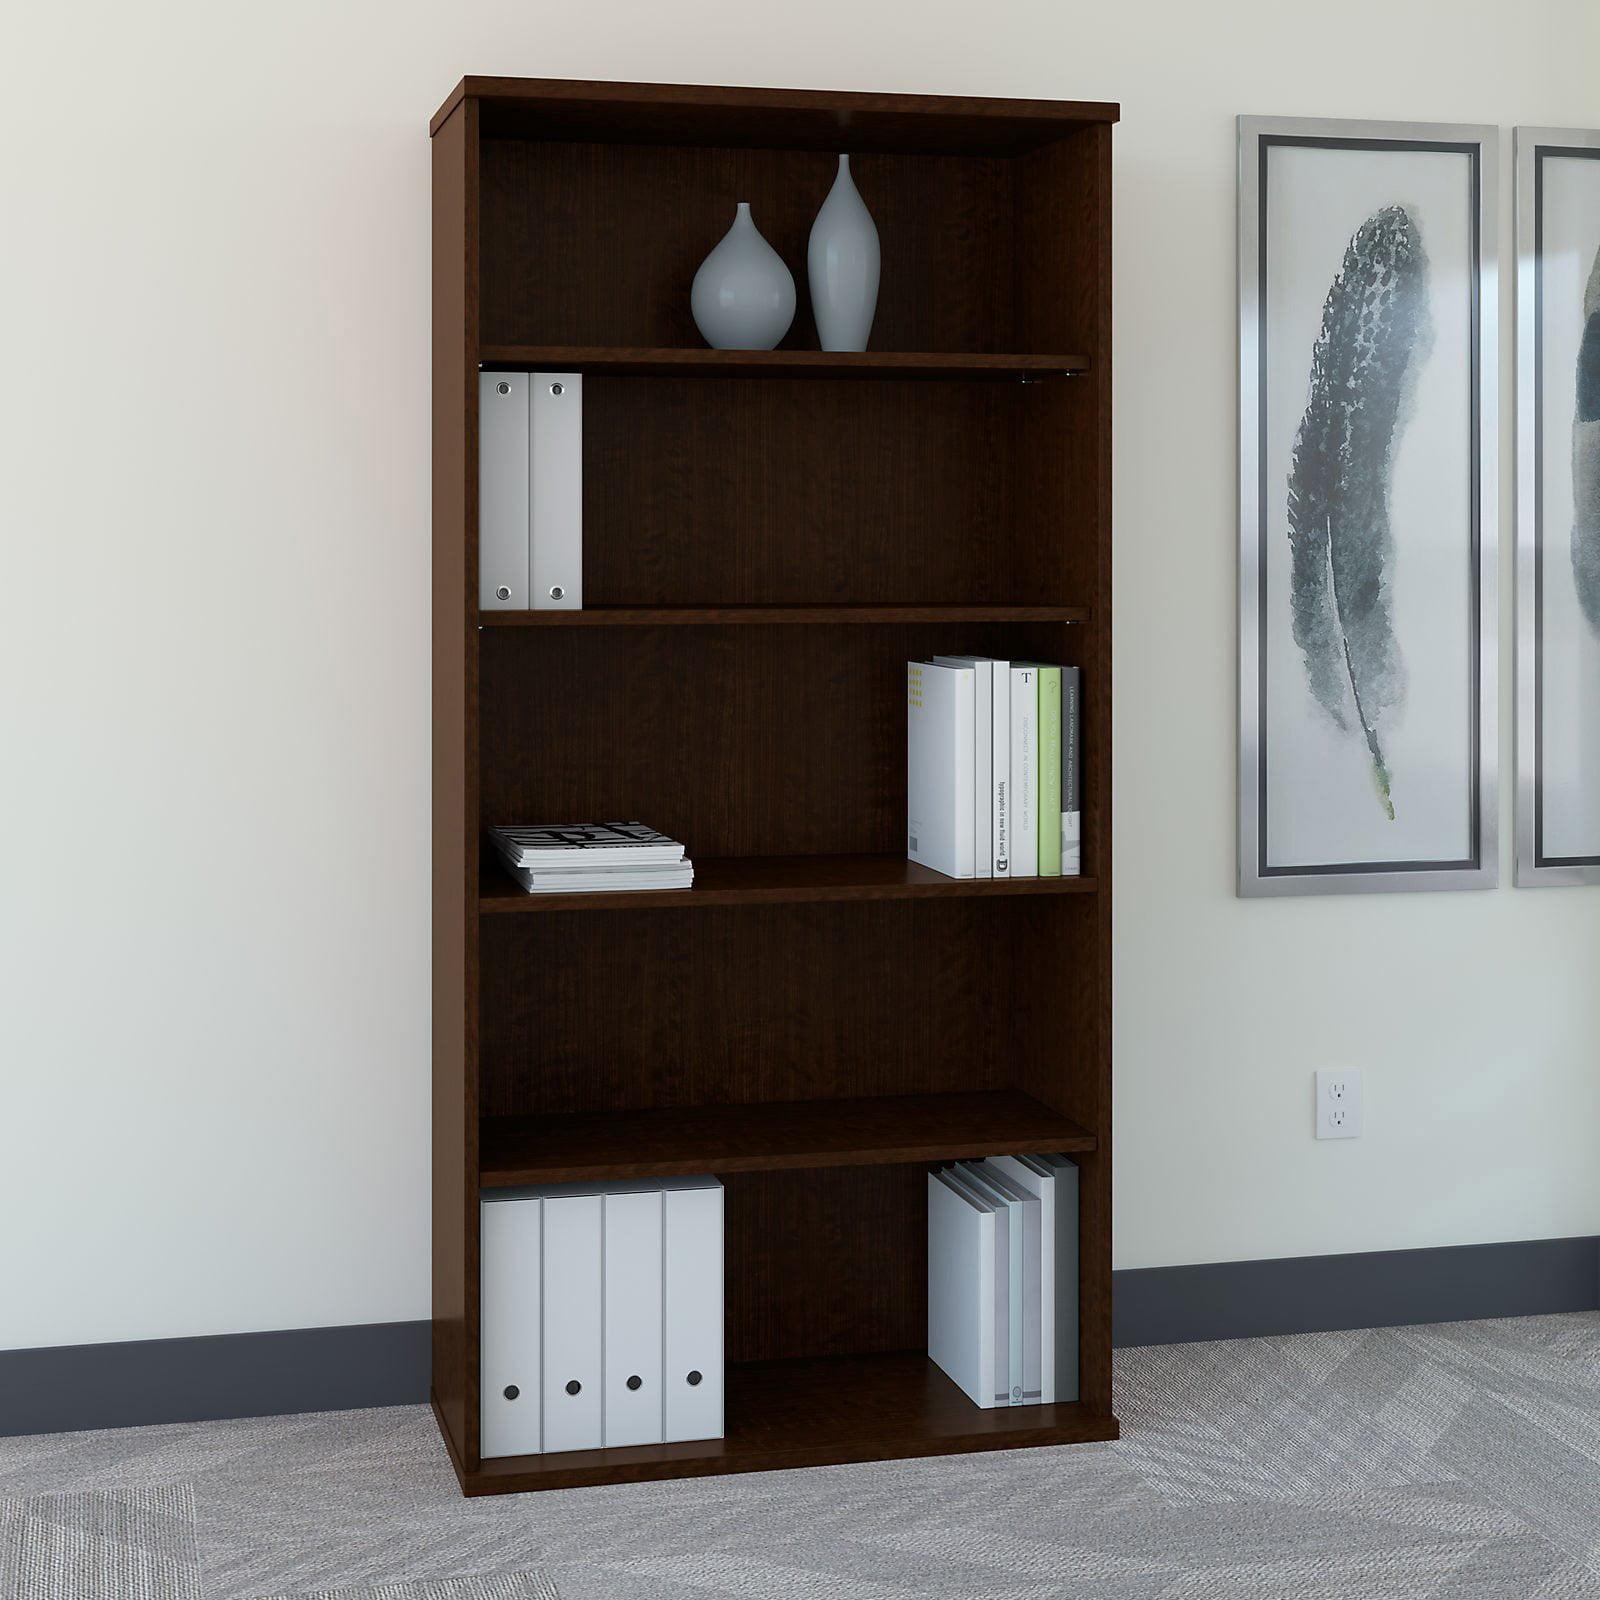 Series C 36 in. Bookcase - Mocha Cherry